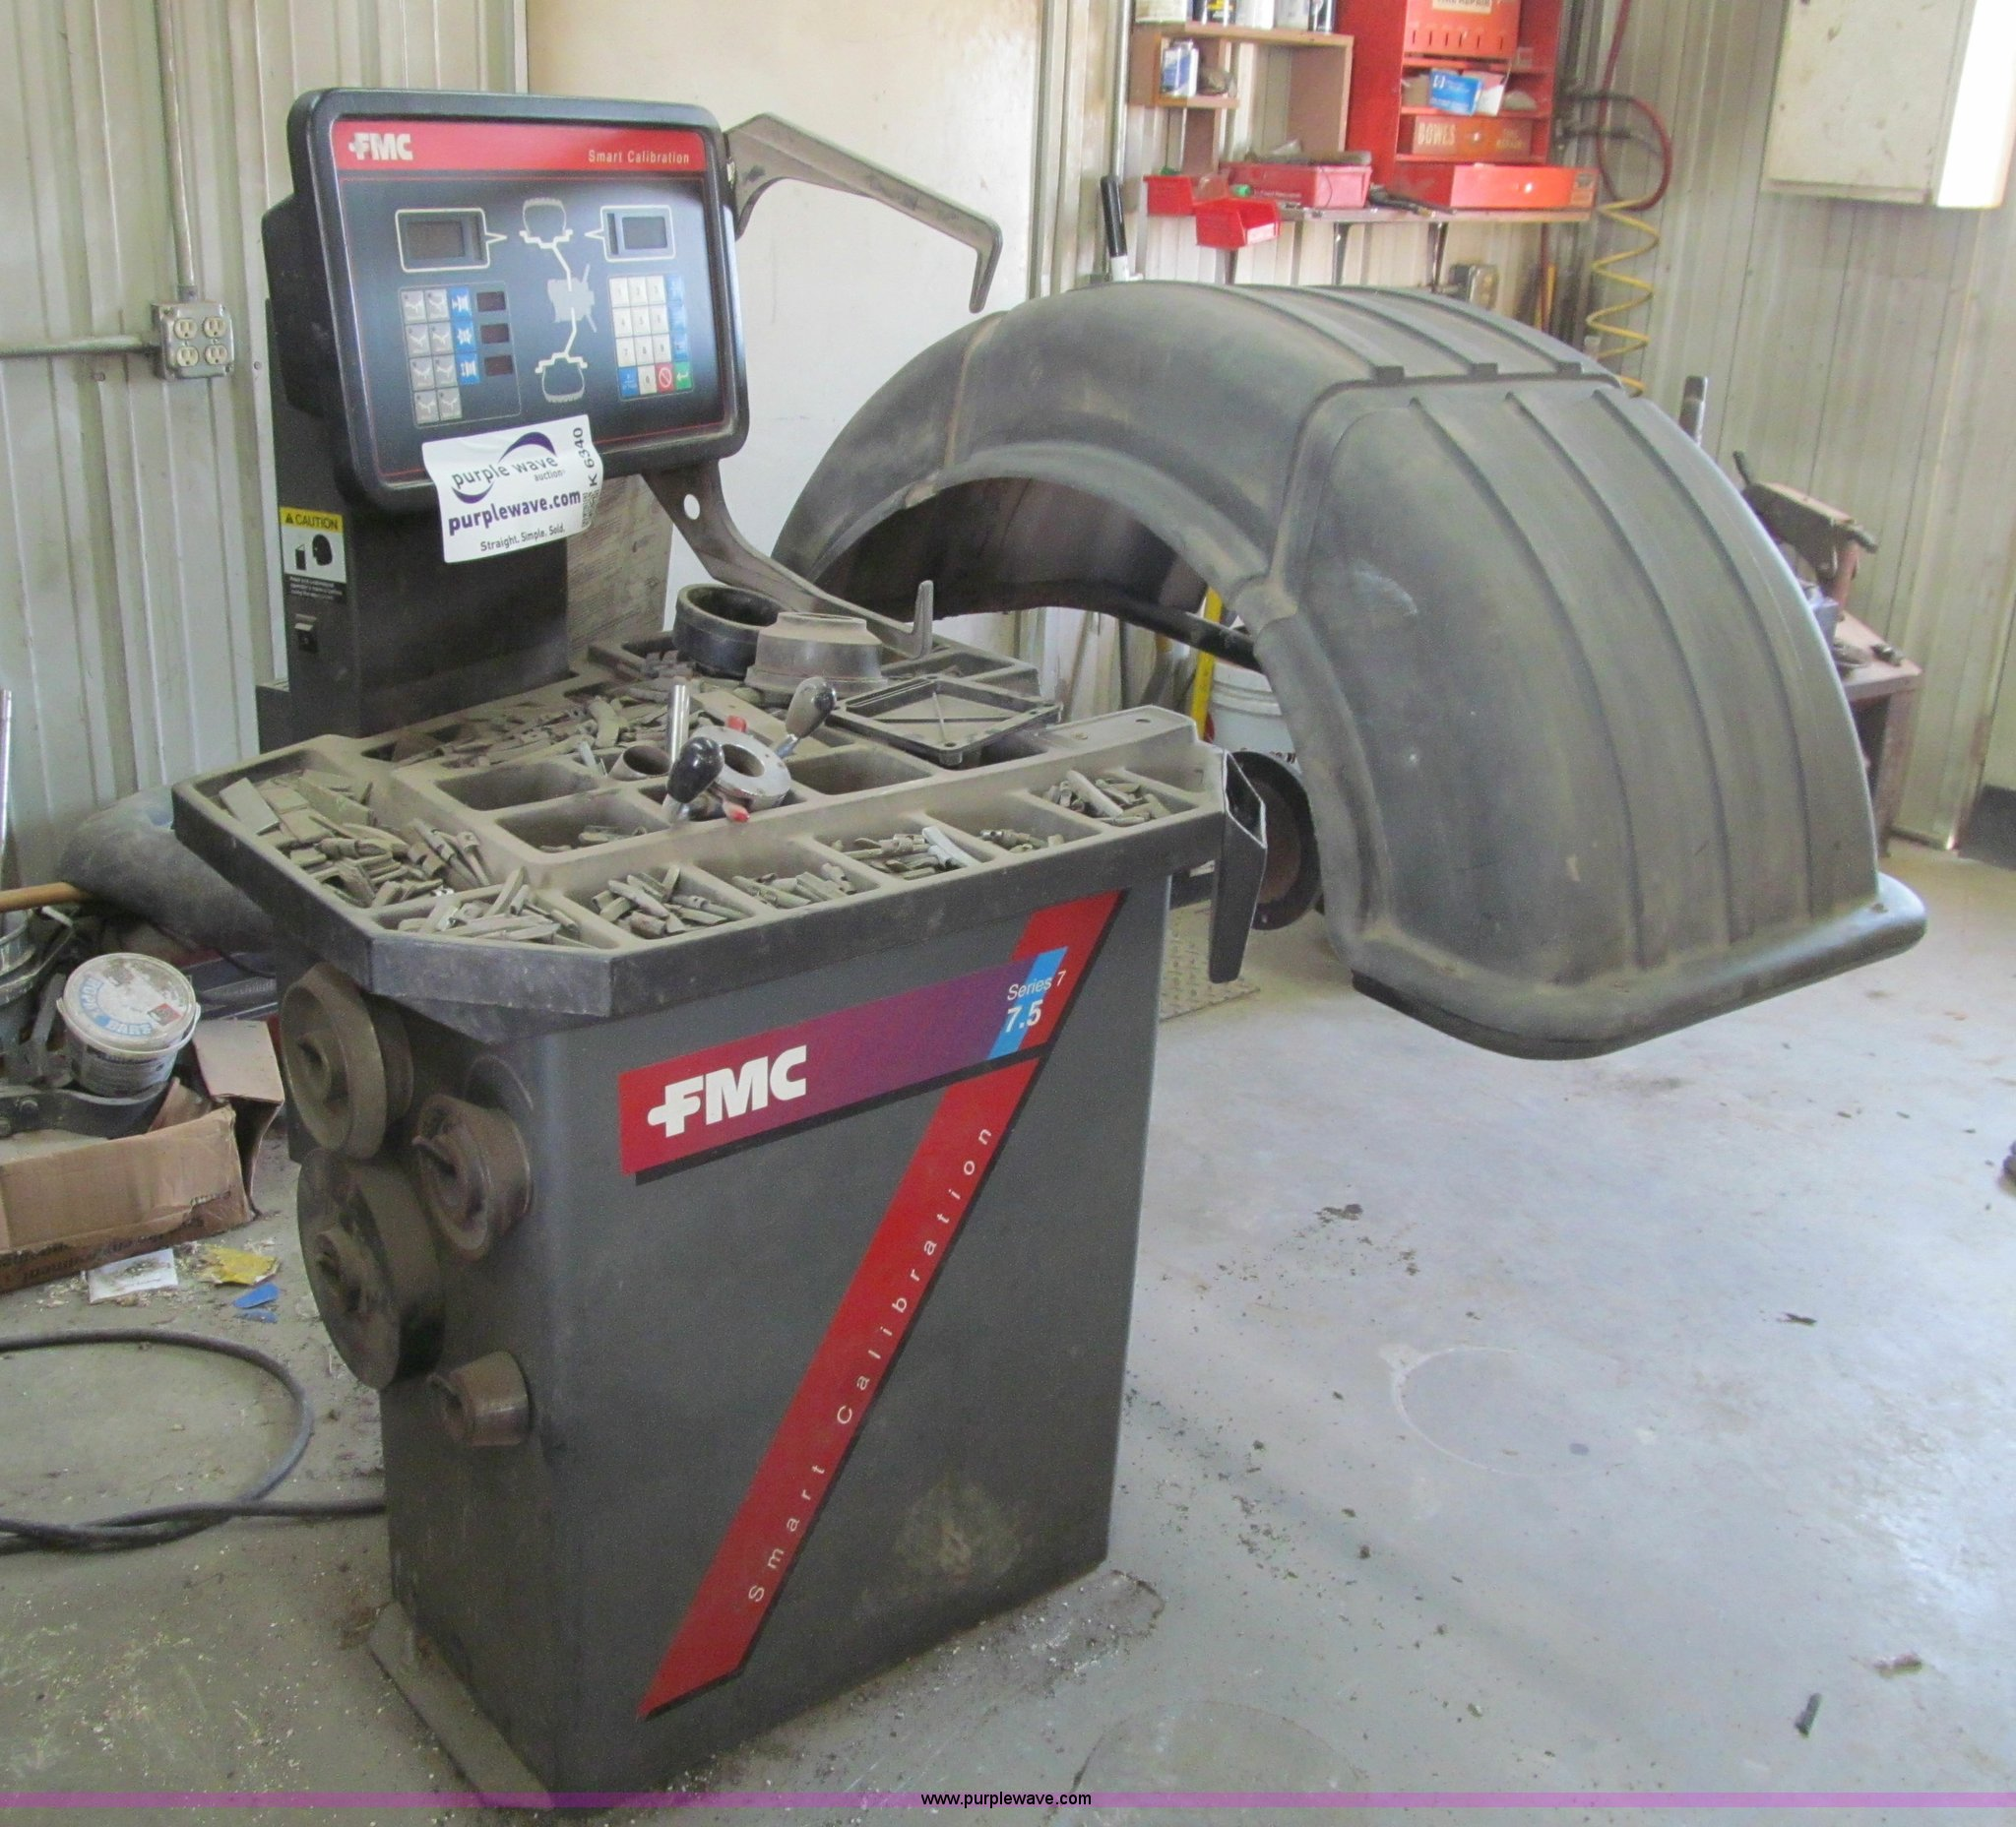 K6340 image for item K6340 FMC Series 7 7.5 Smart Calibration wheel balancer